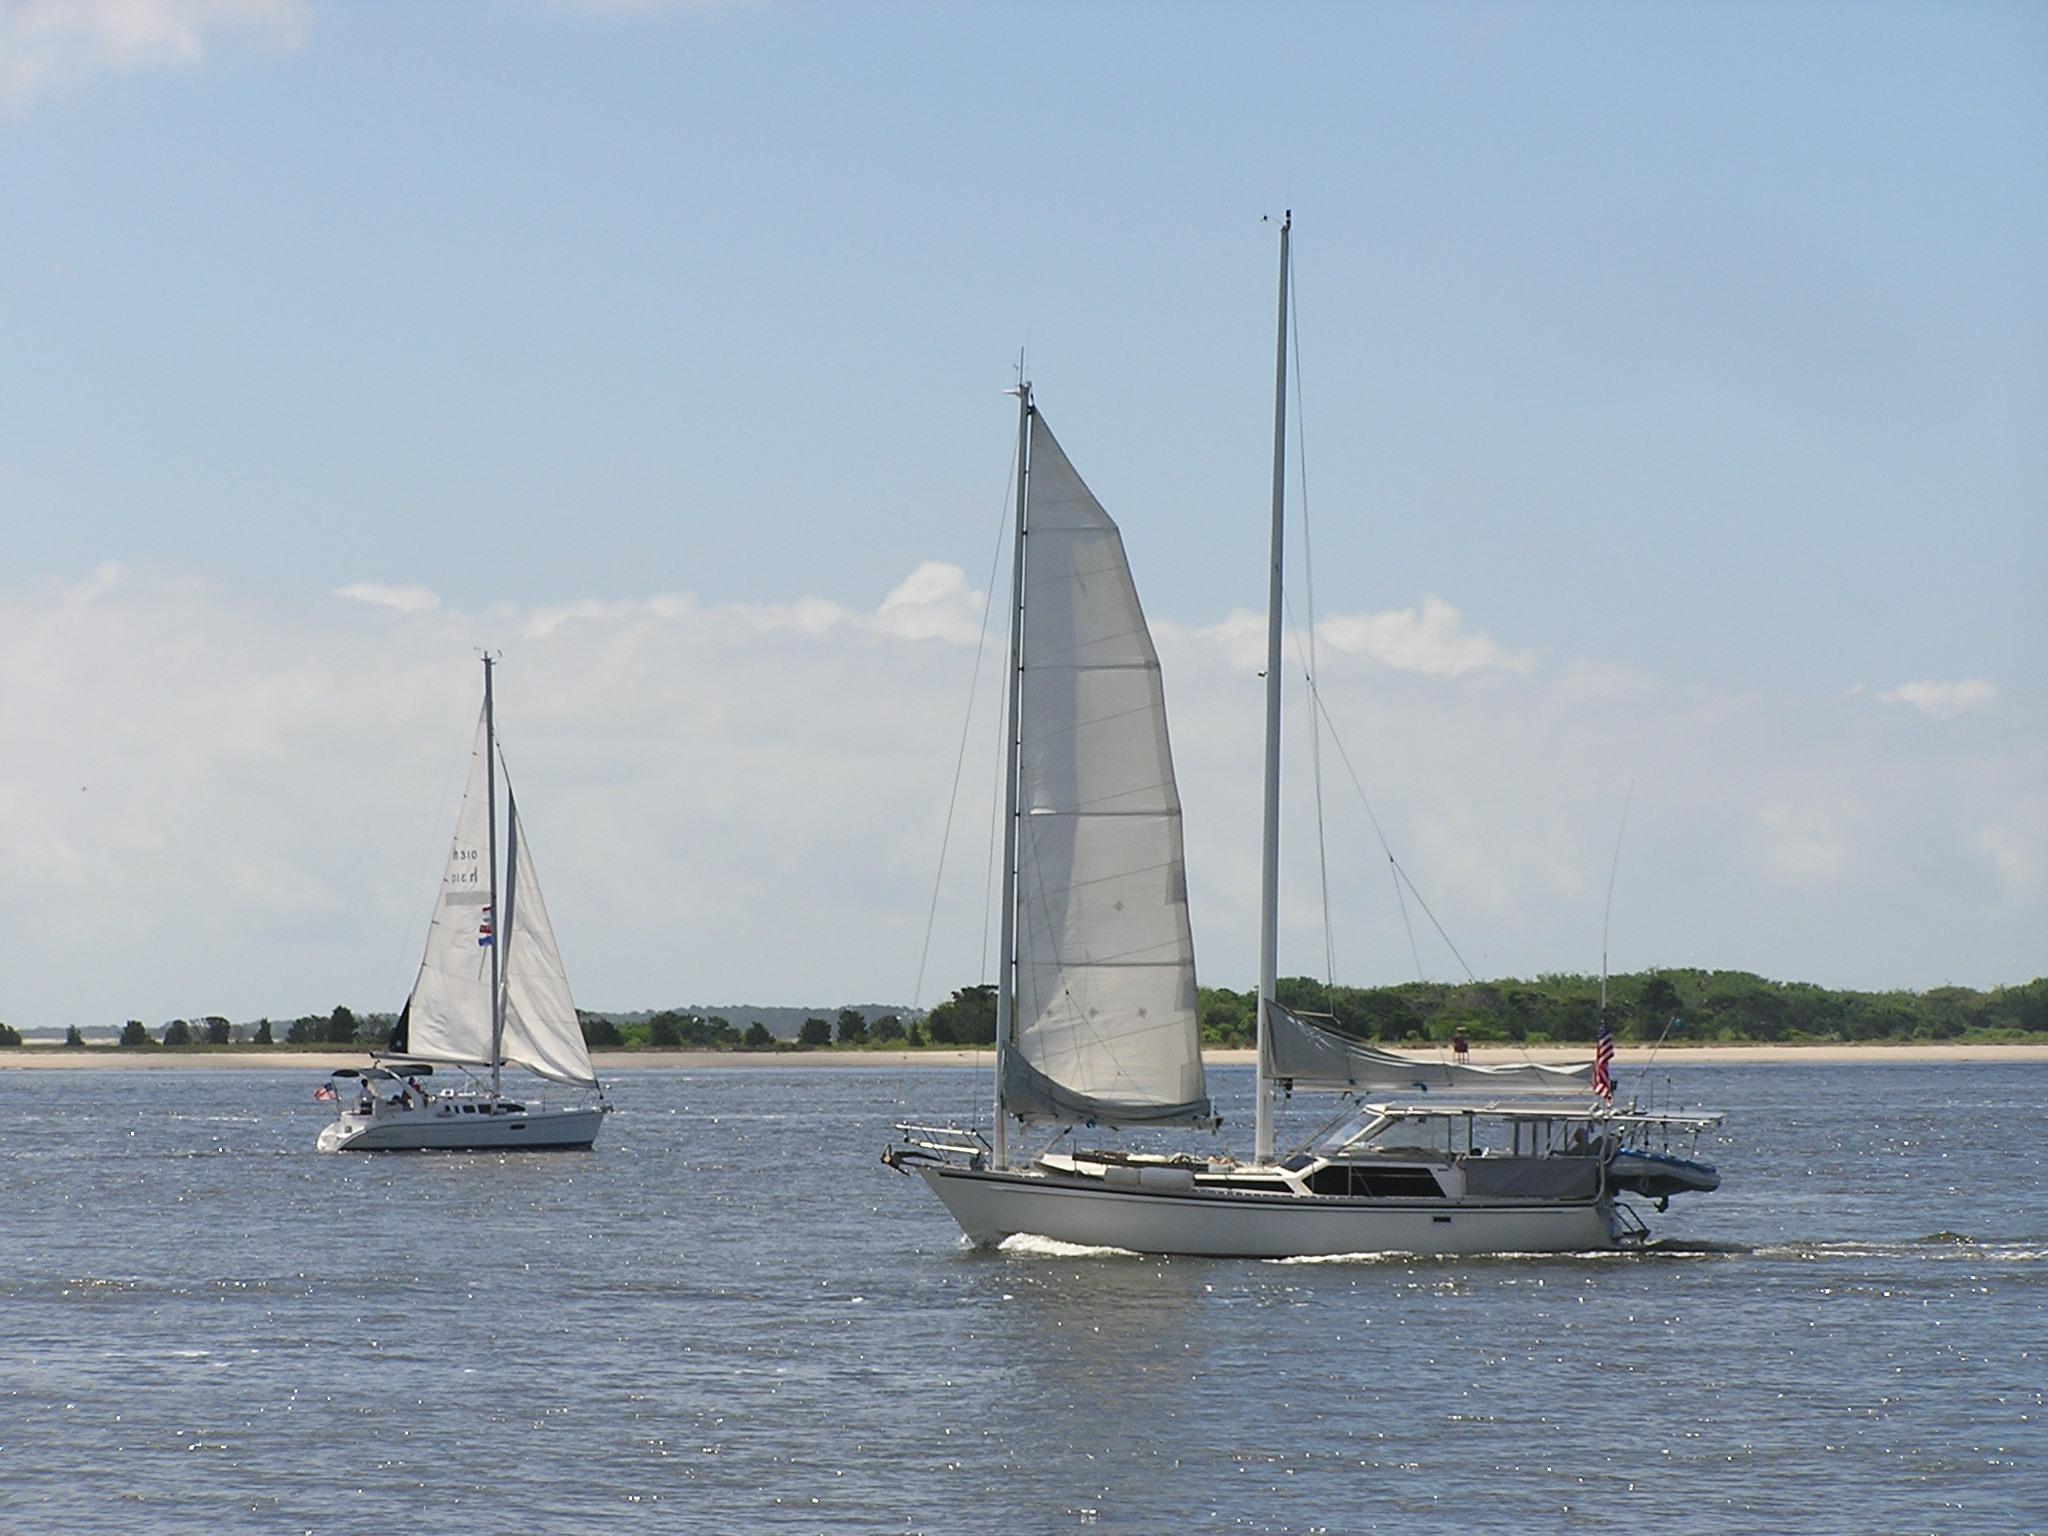 Sailboats in Cape Fear River